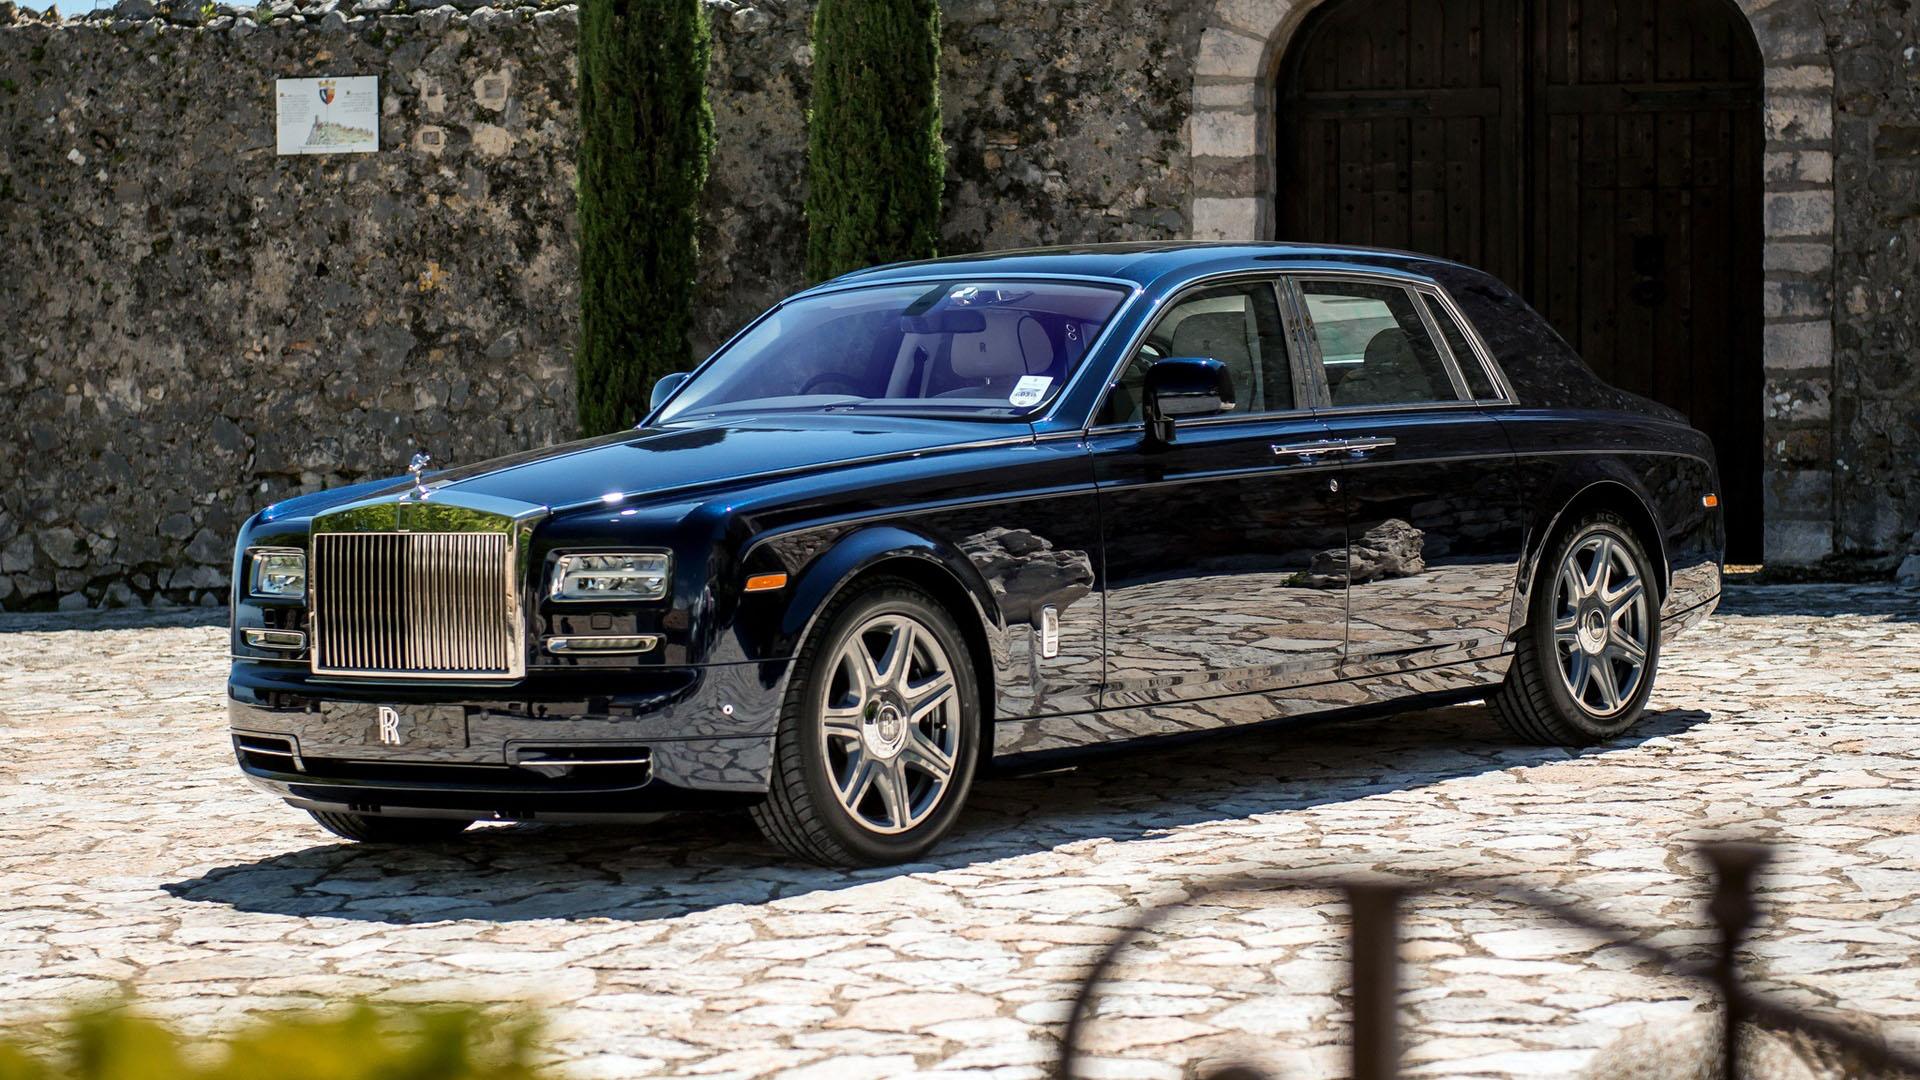 Wallpaper Rolls Royce Phantom Series 2 Rolls Royce 1920x1080